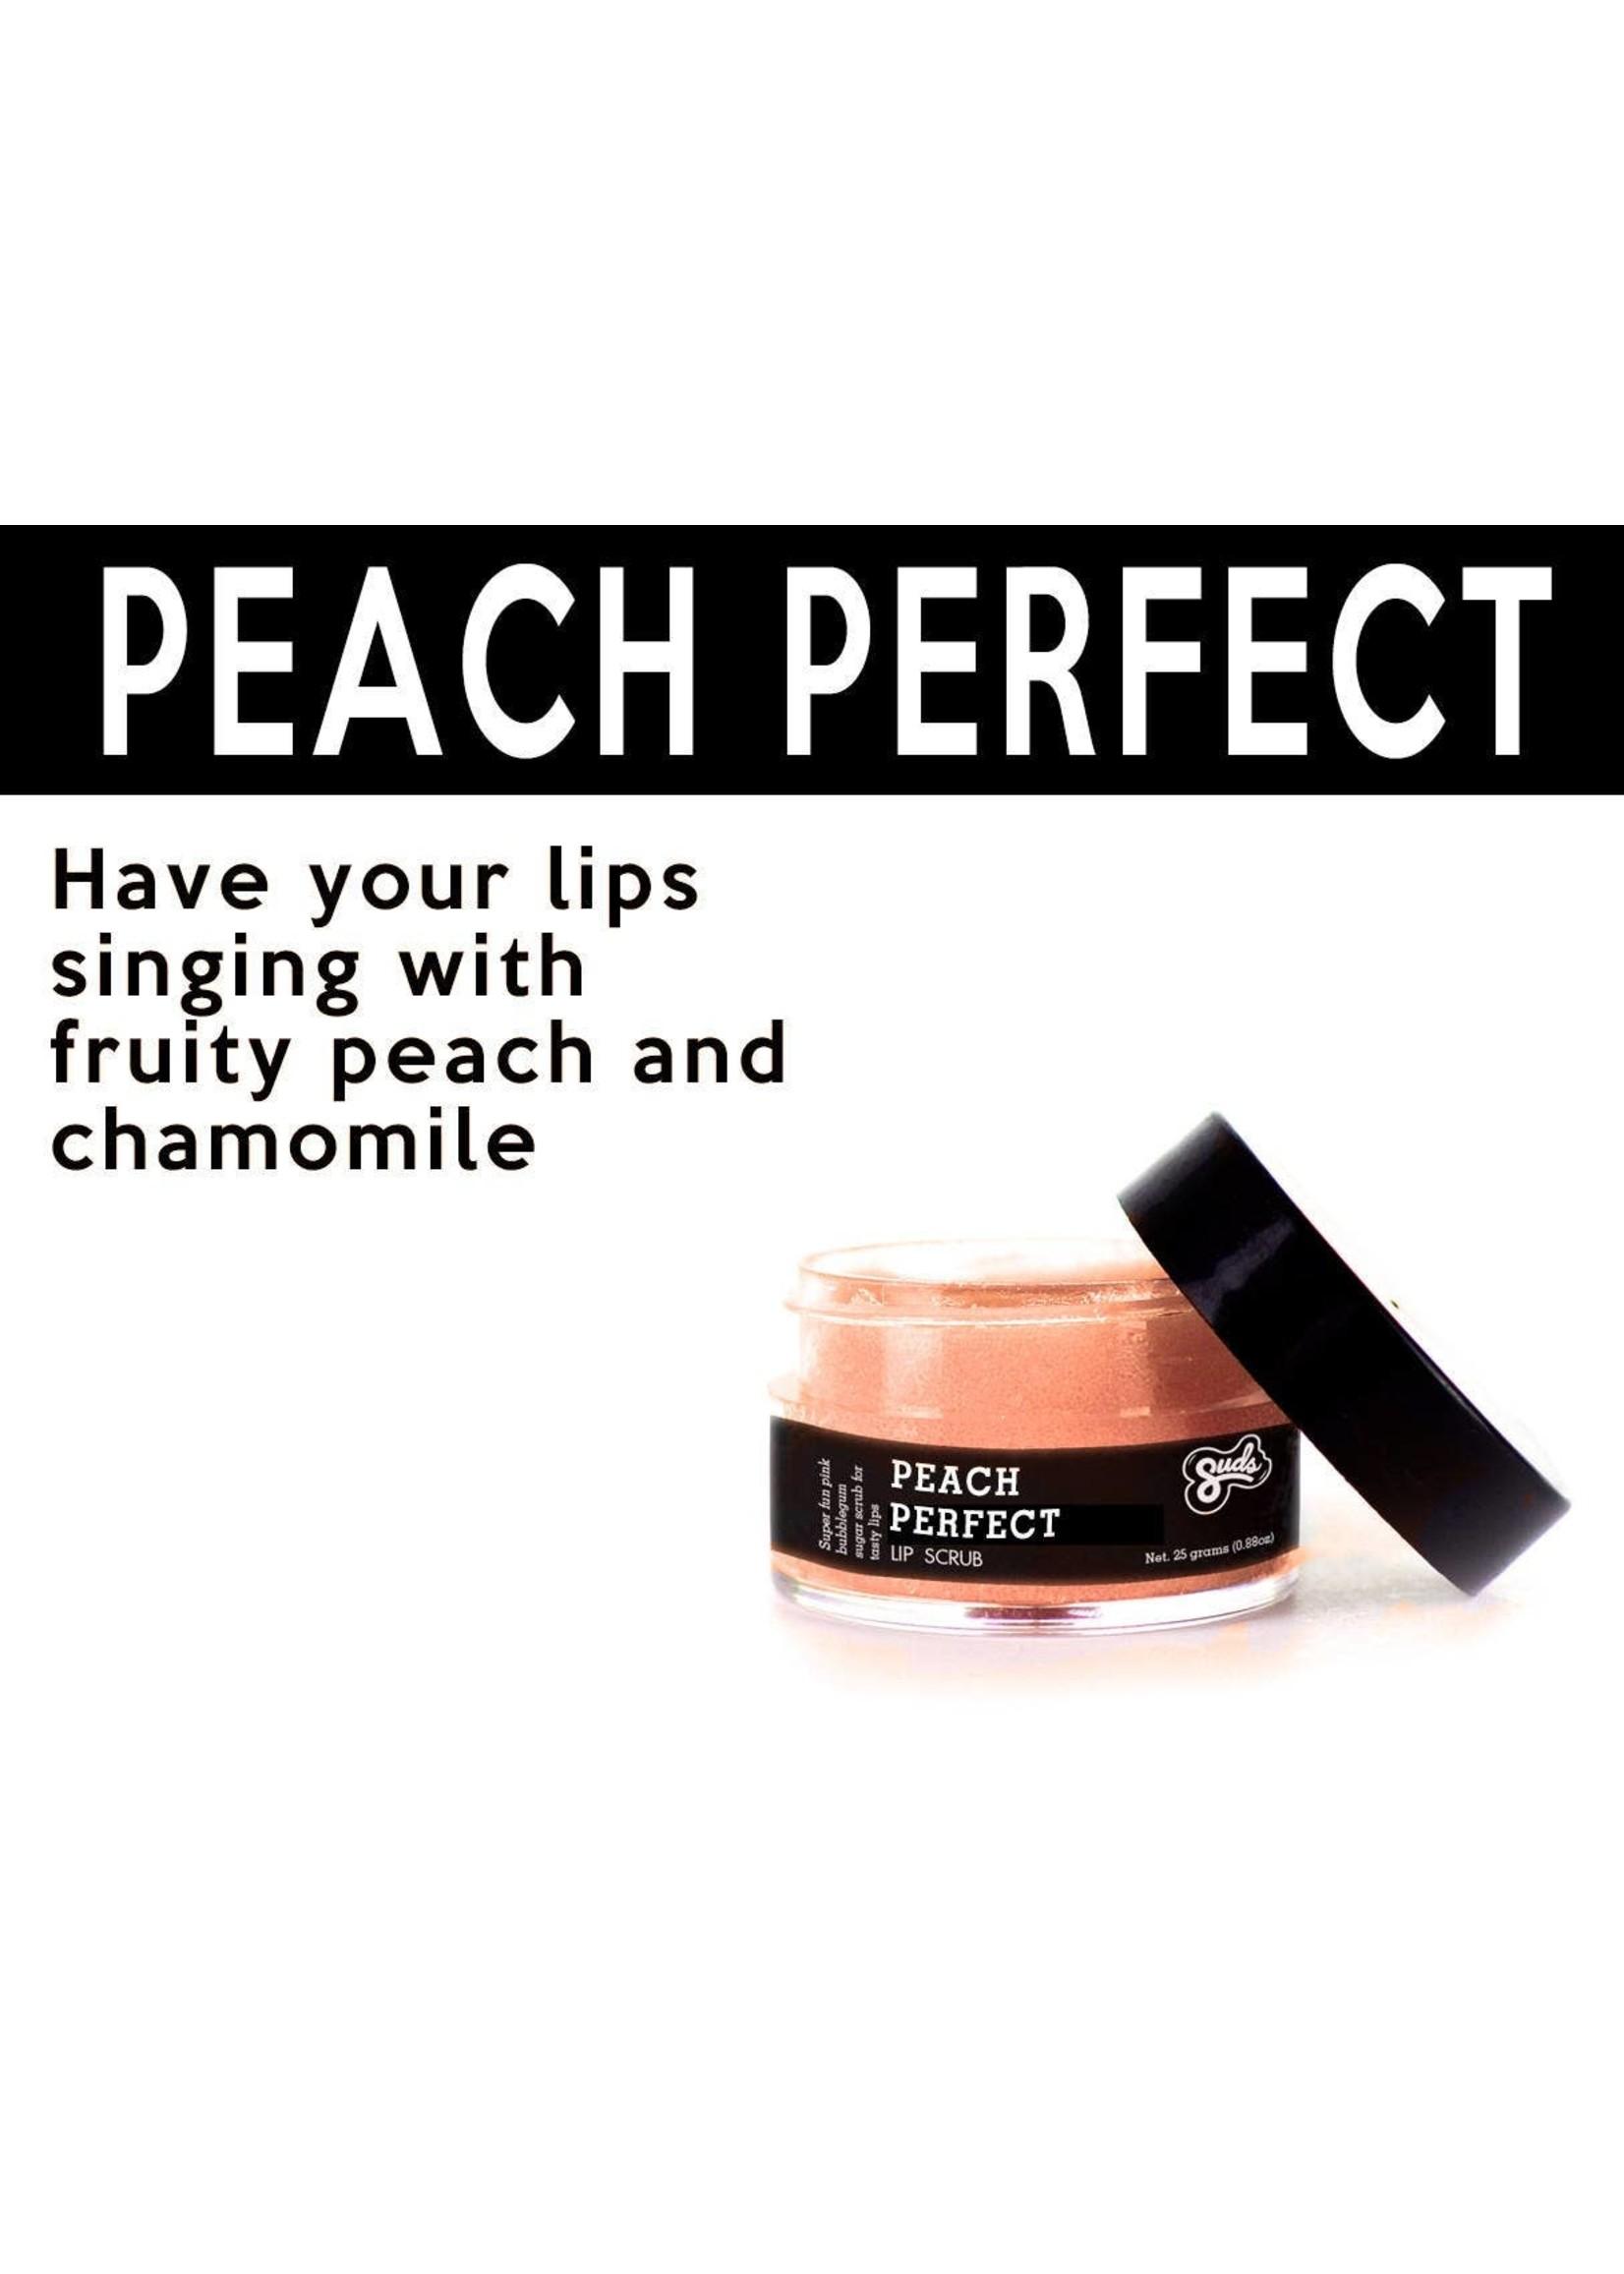 Sudsatorium Peach Perfect Lip Scrub